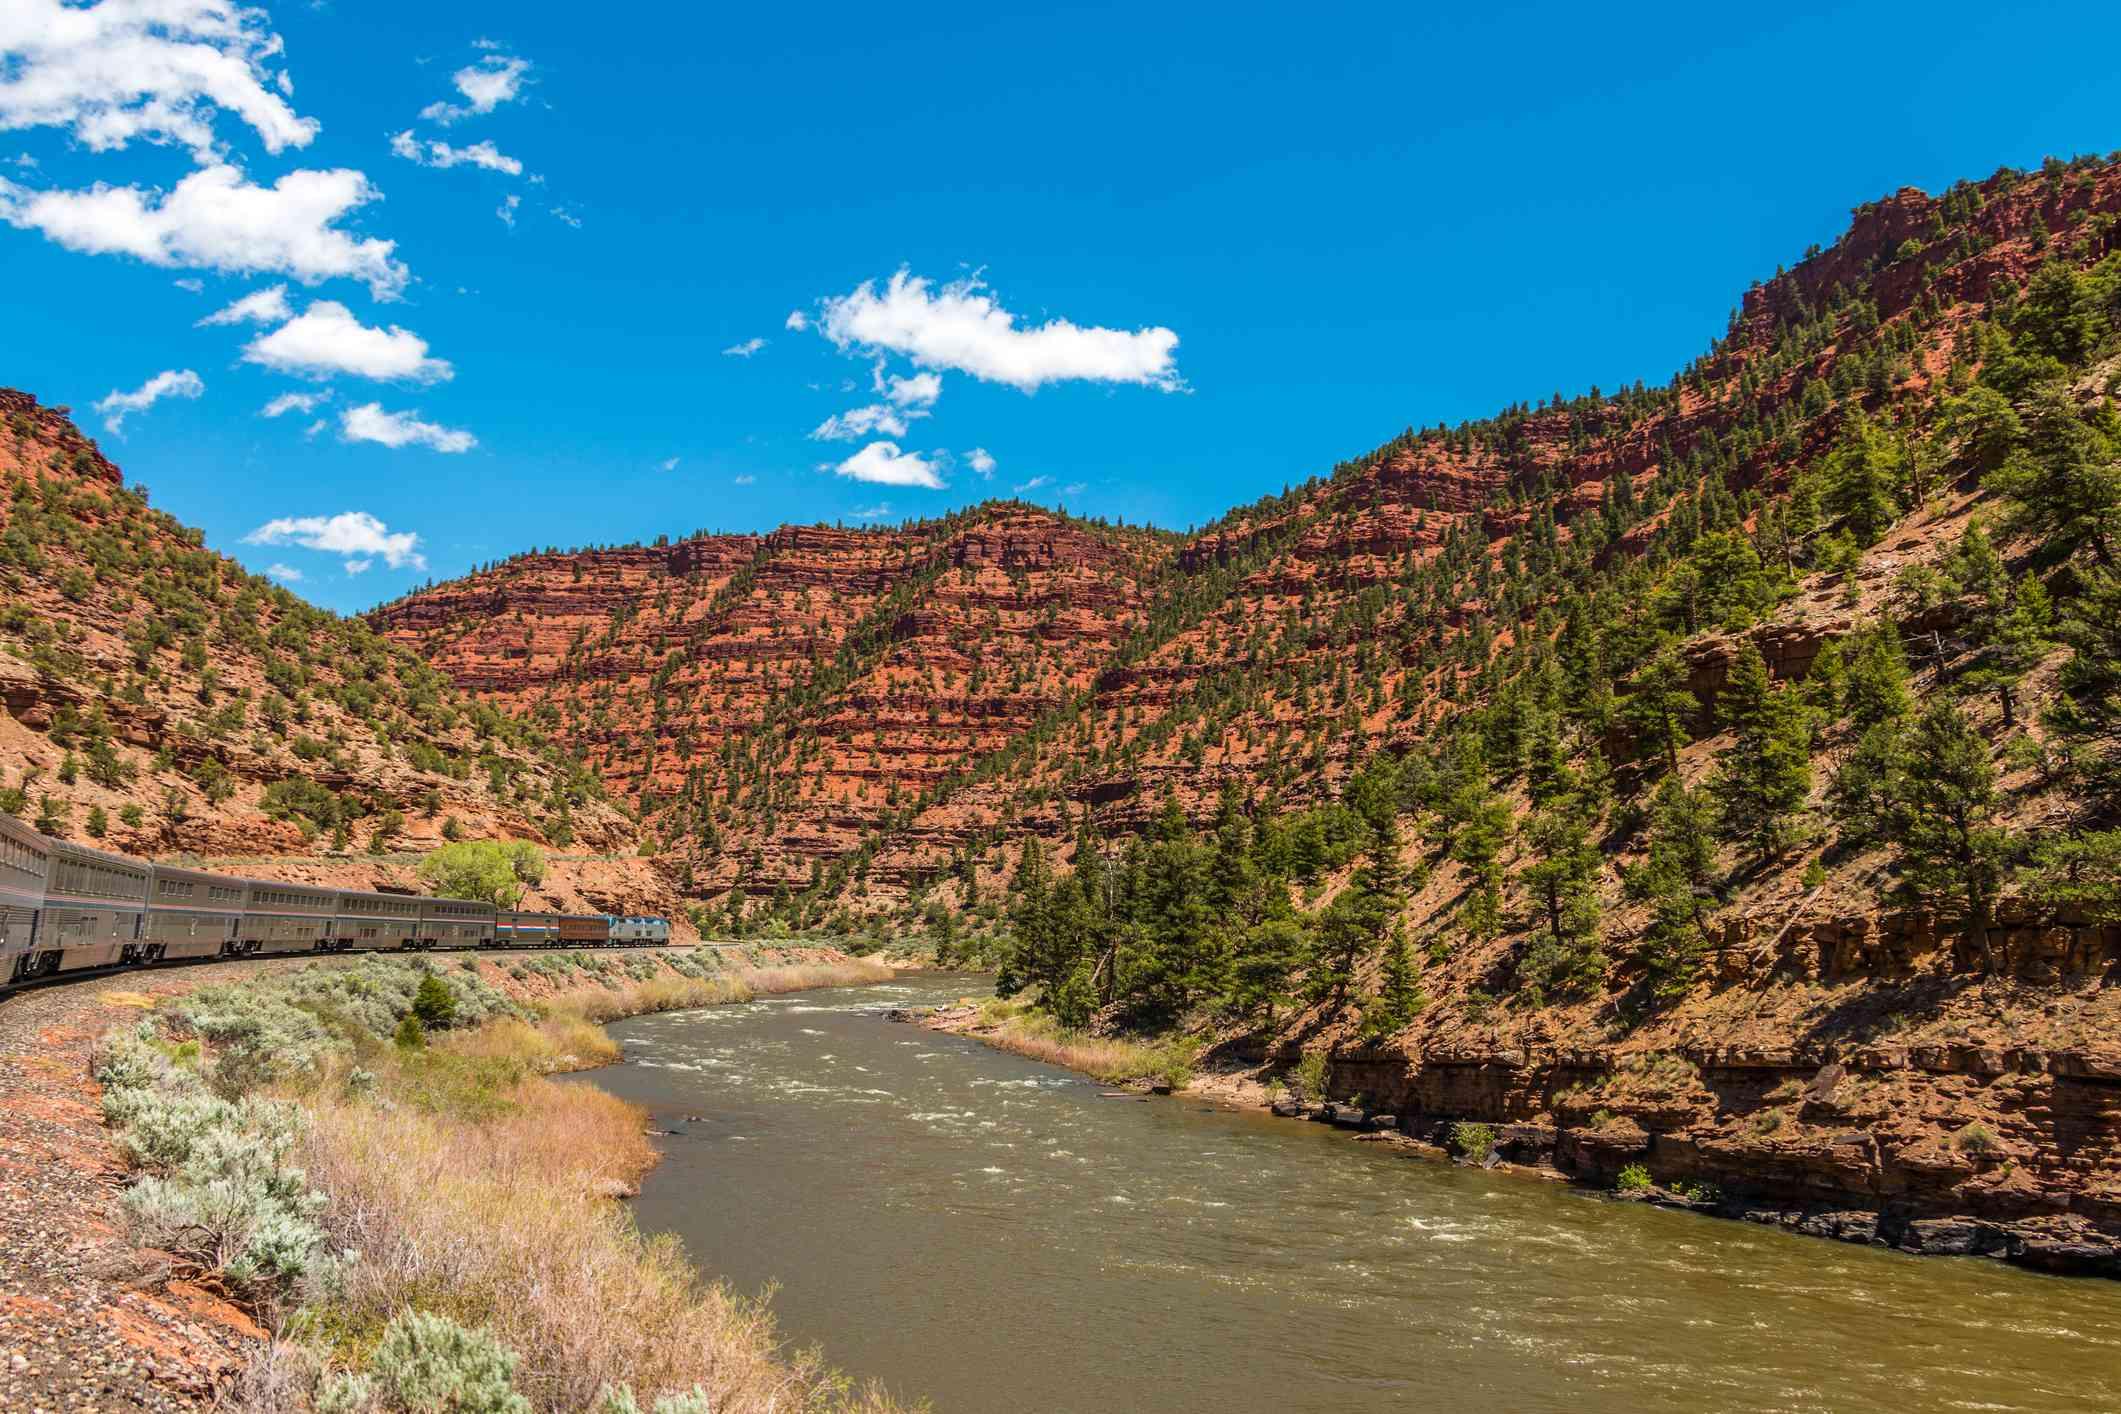 California Zepher traveling through the Colorado Rockies